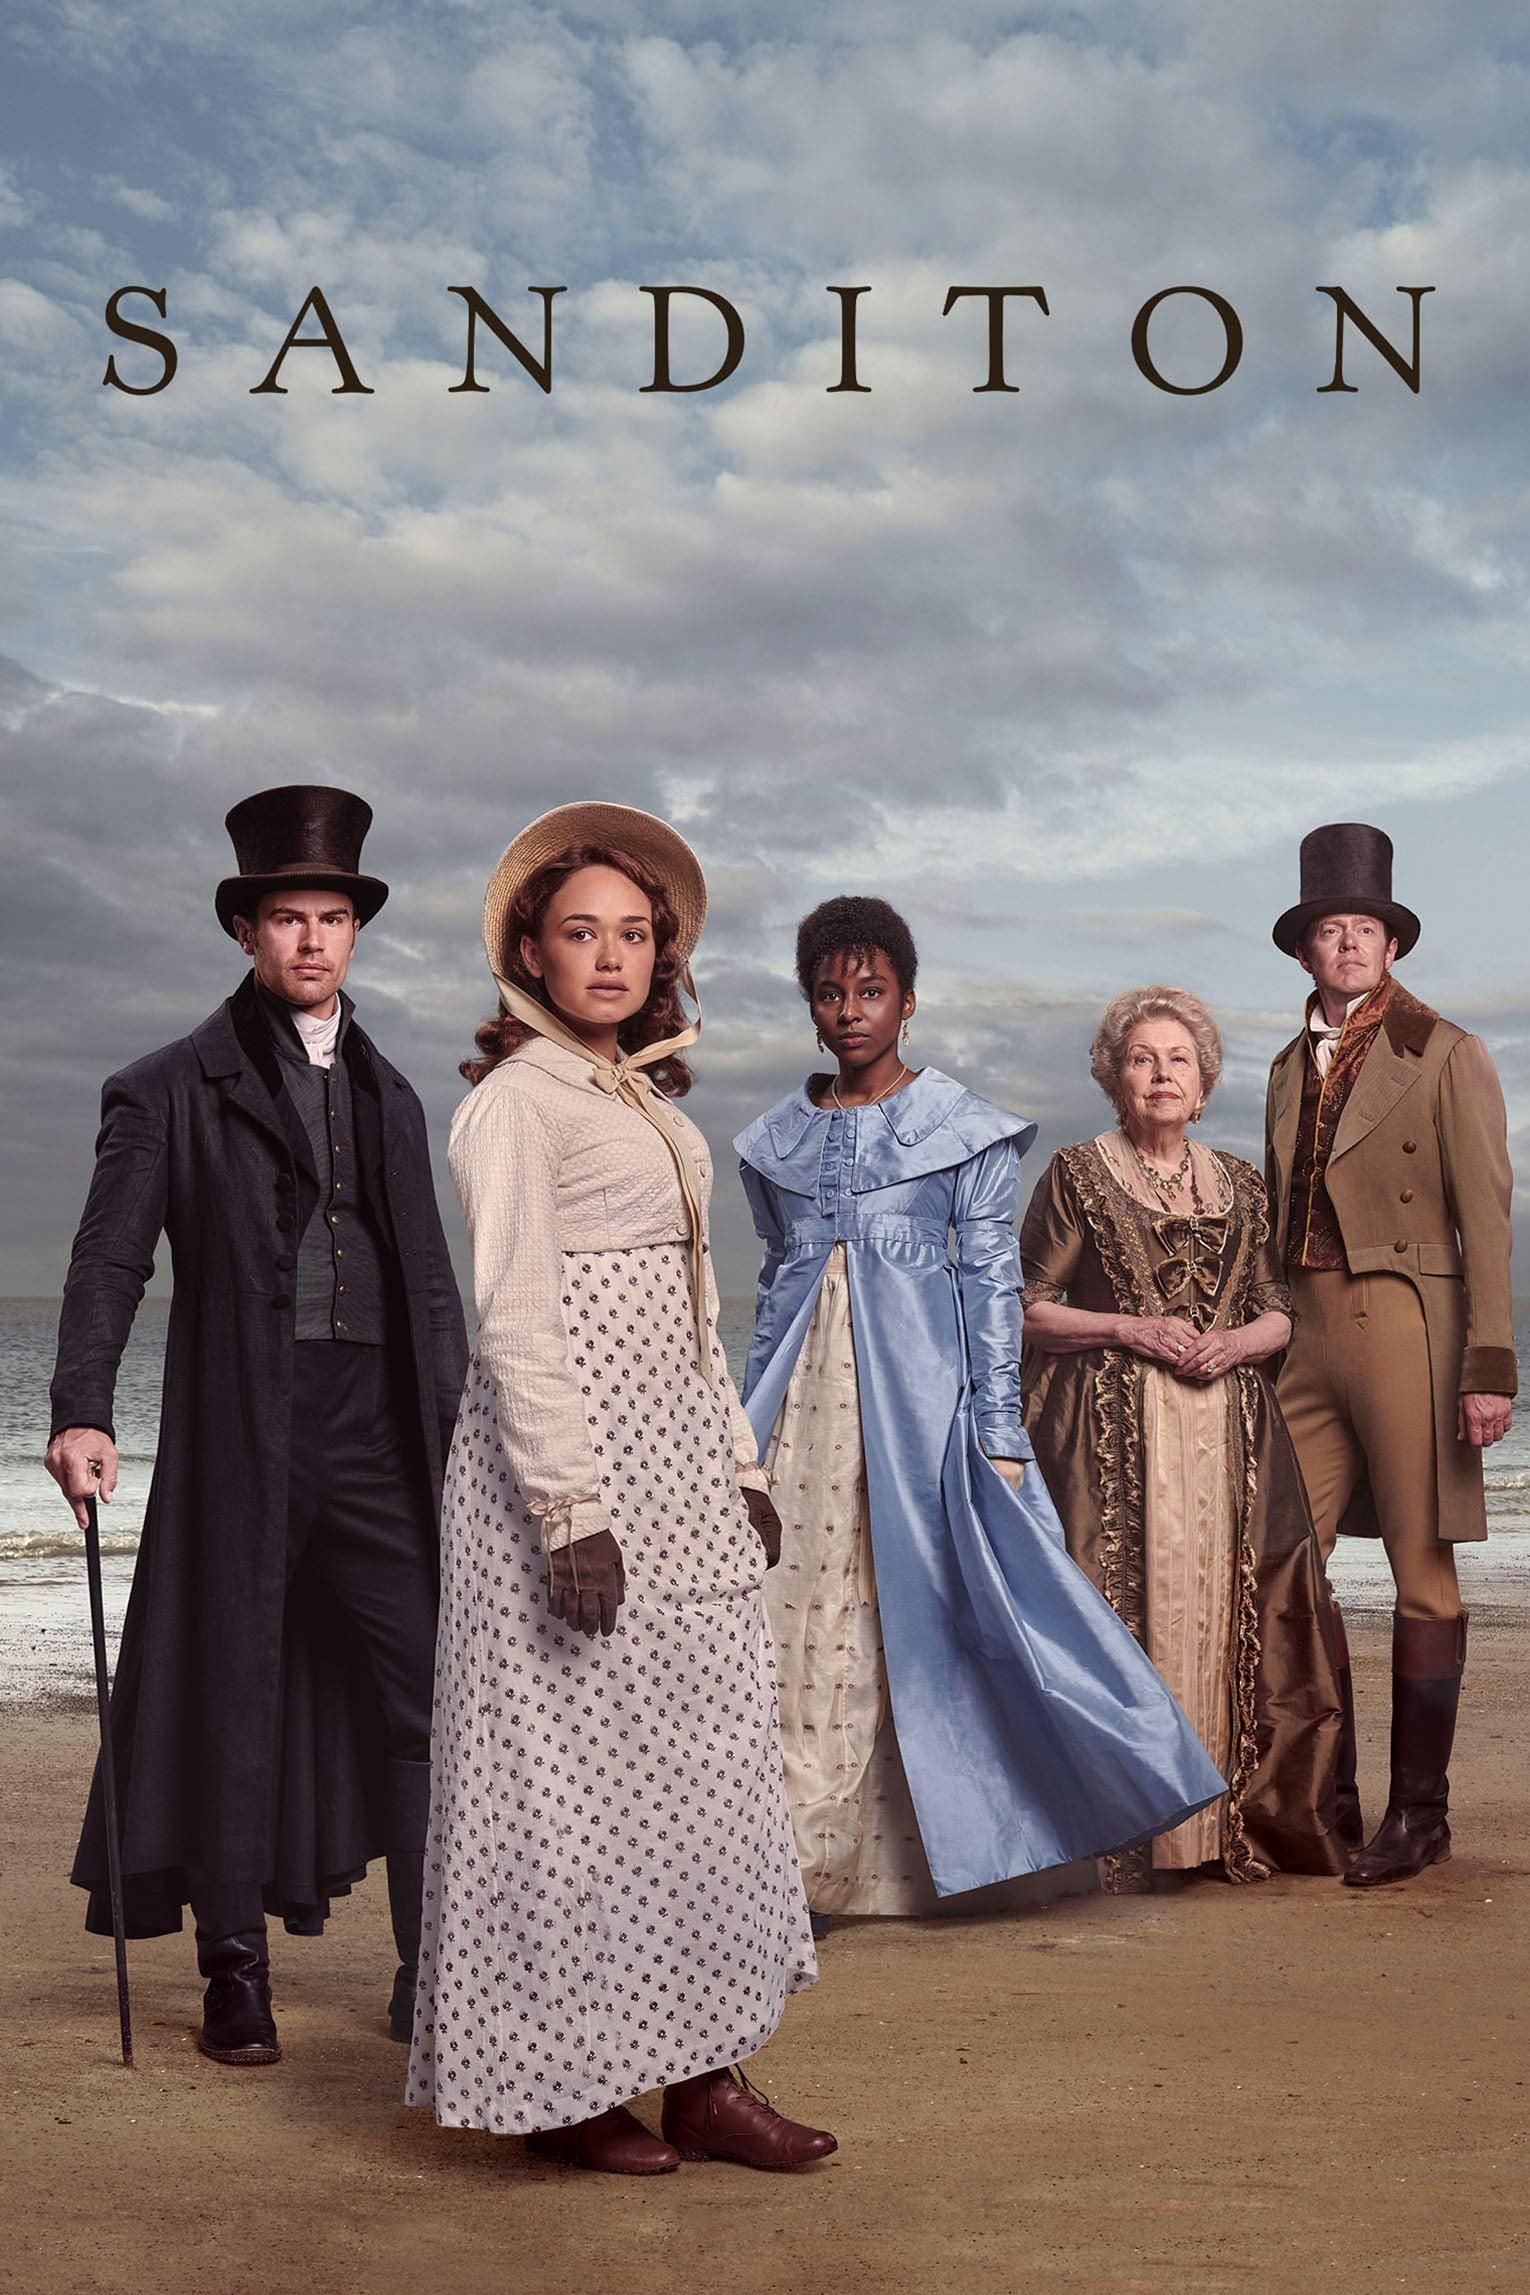 Sanditon TV Shows About Costume Drama